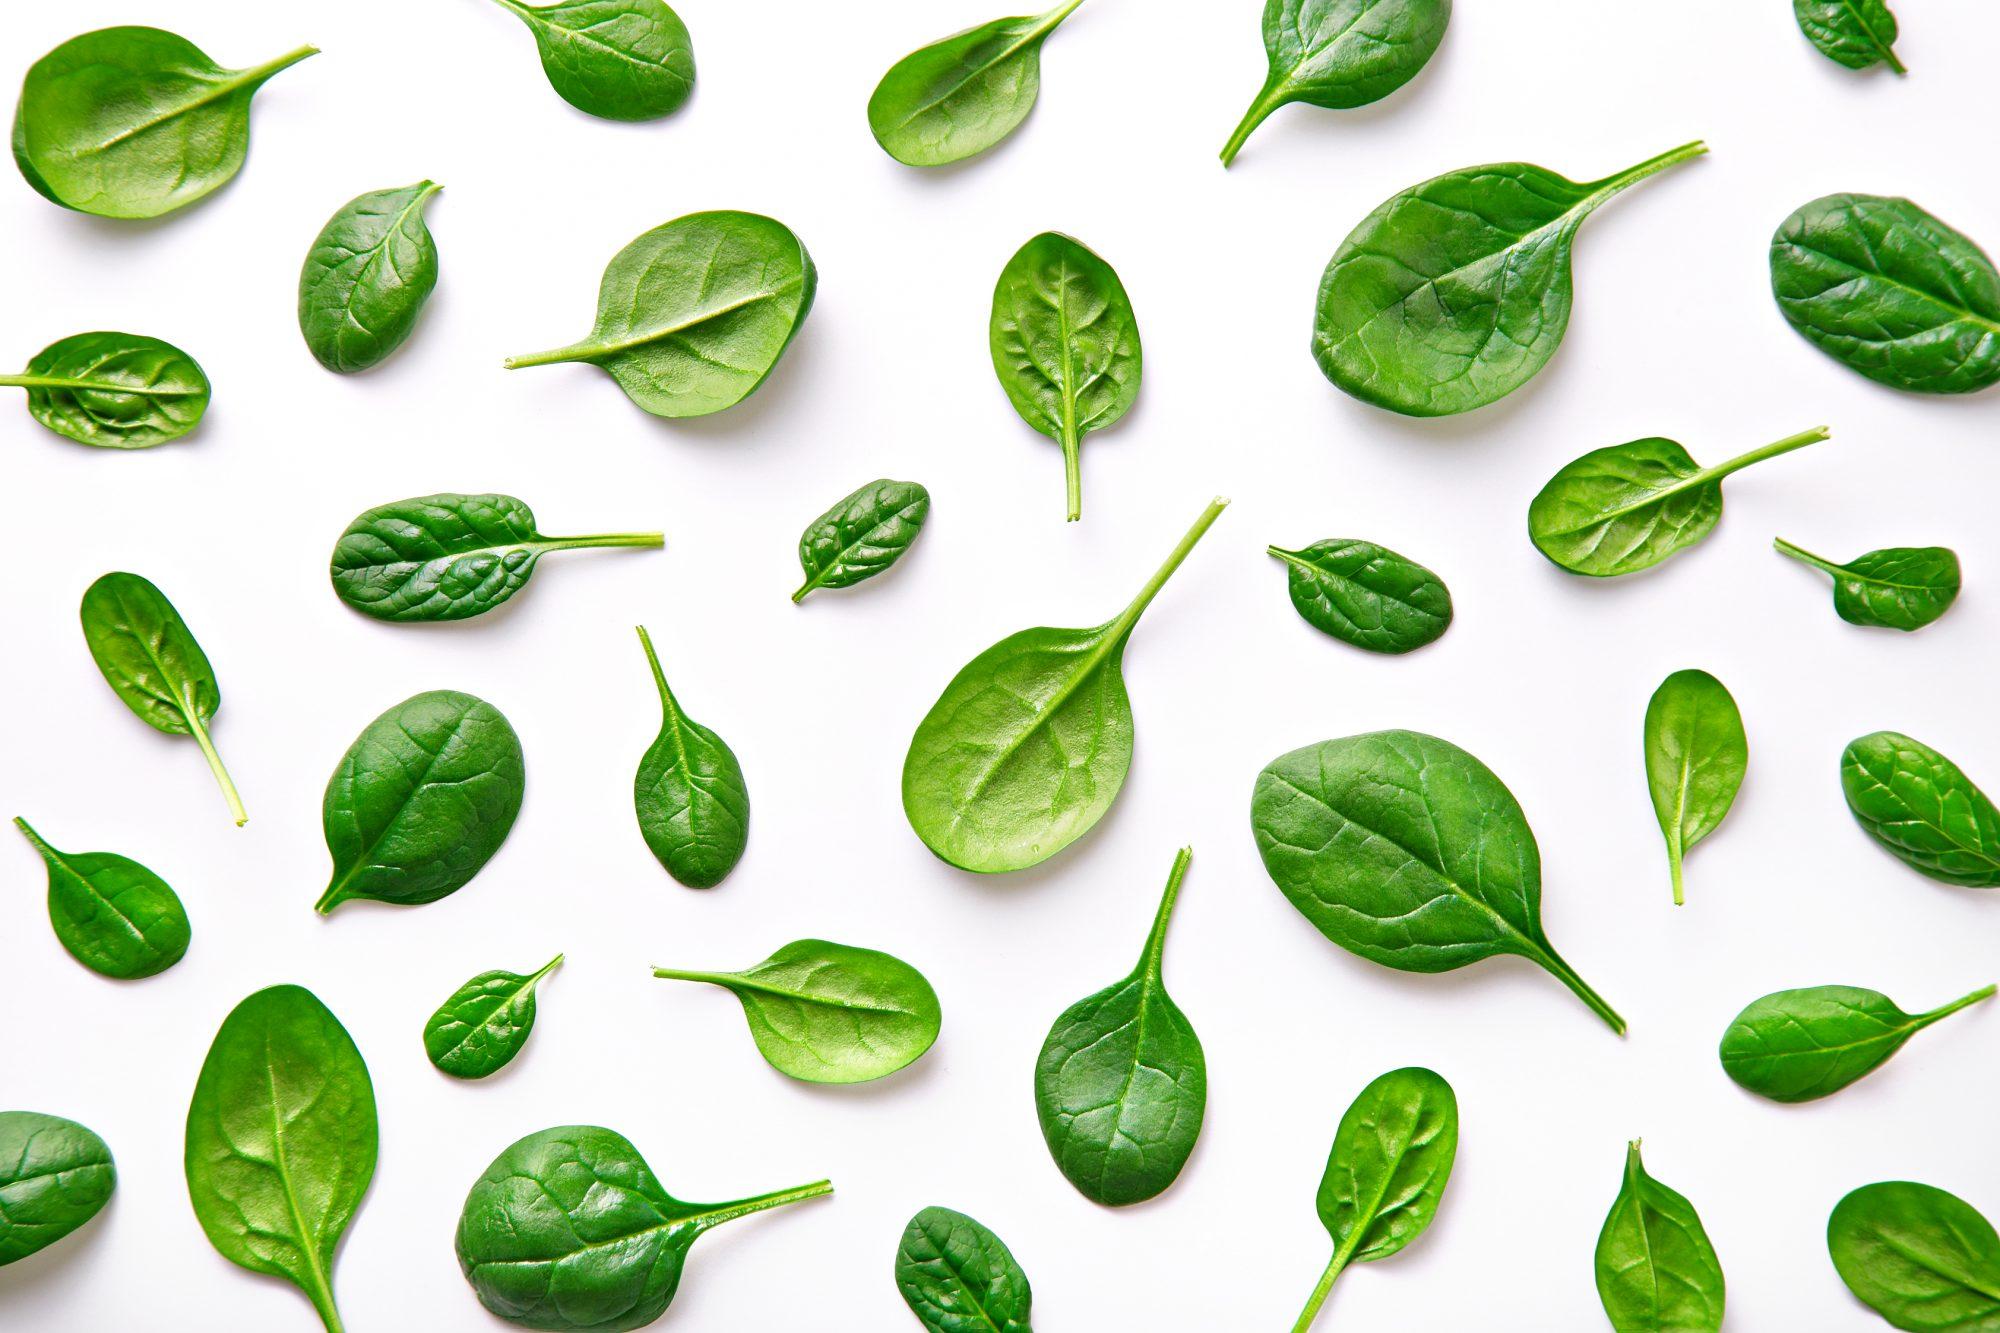 Getty 2/6/20 Spinach